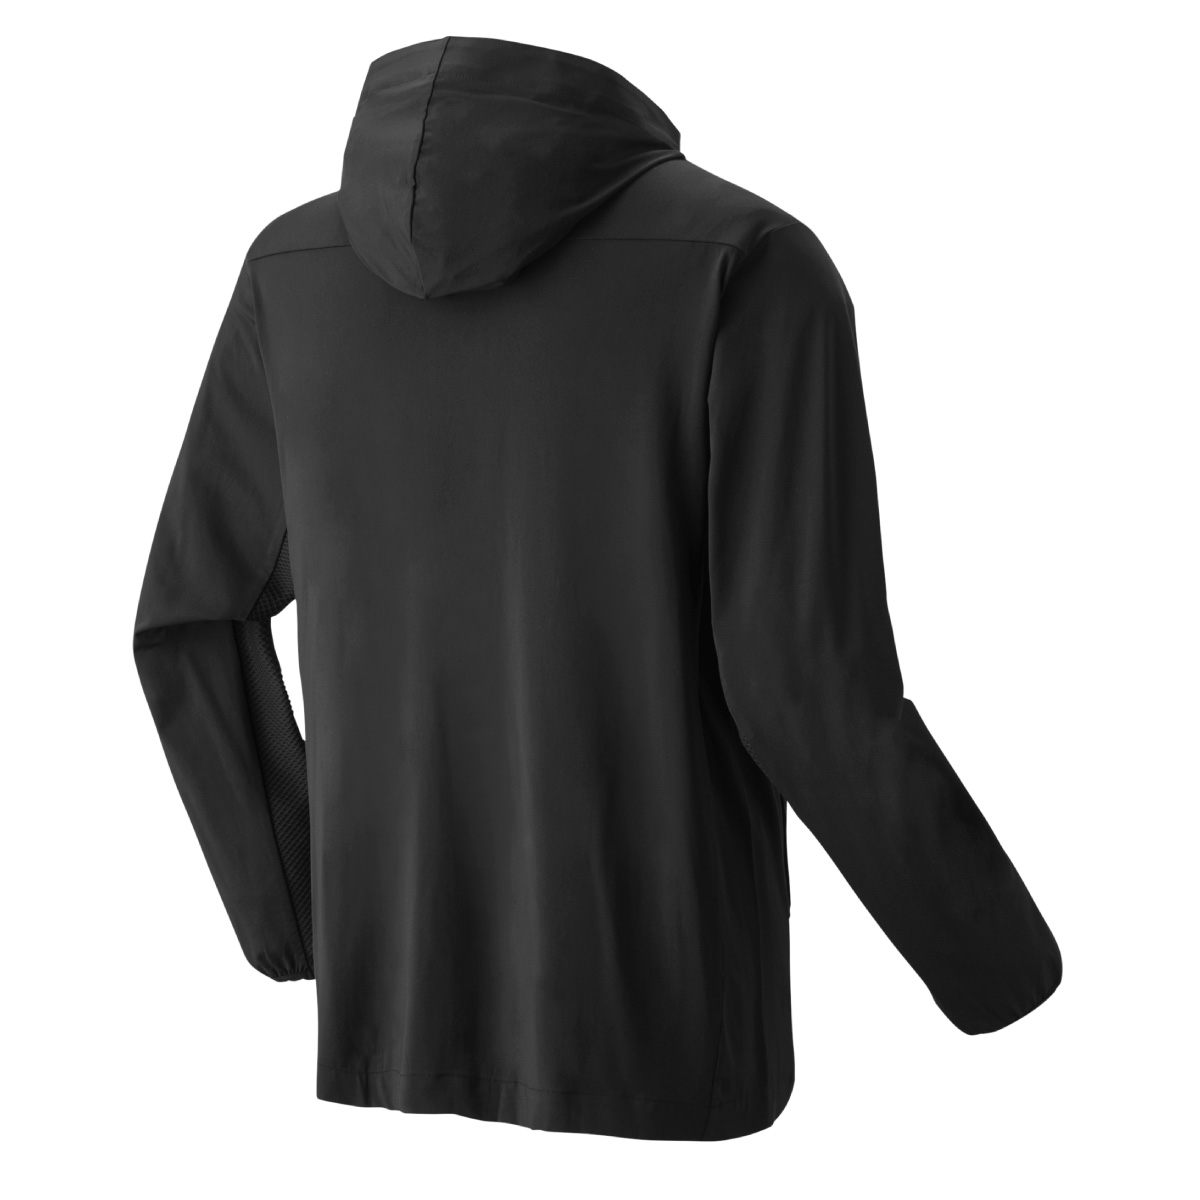 YONEX - Men's Warm-up Jacket, Practice #50086Detailbild - 1